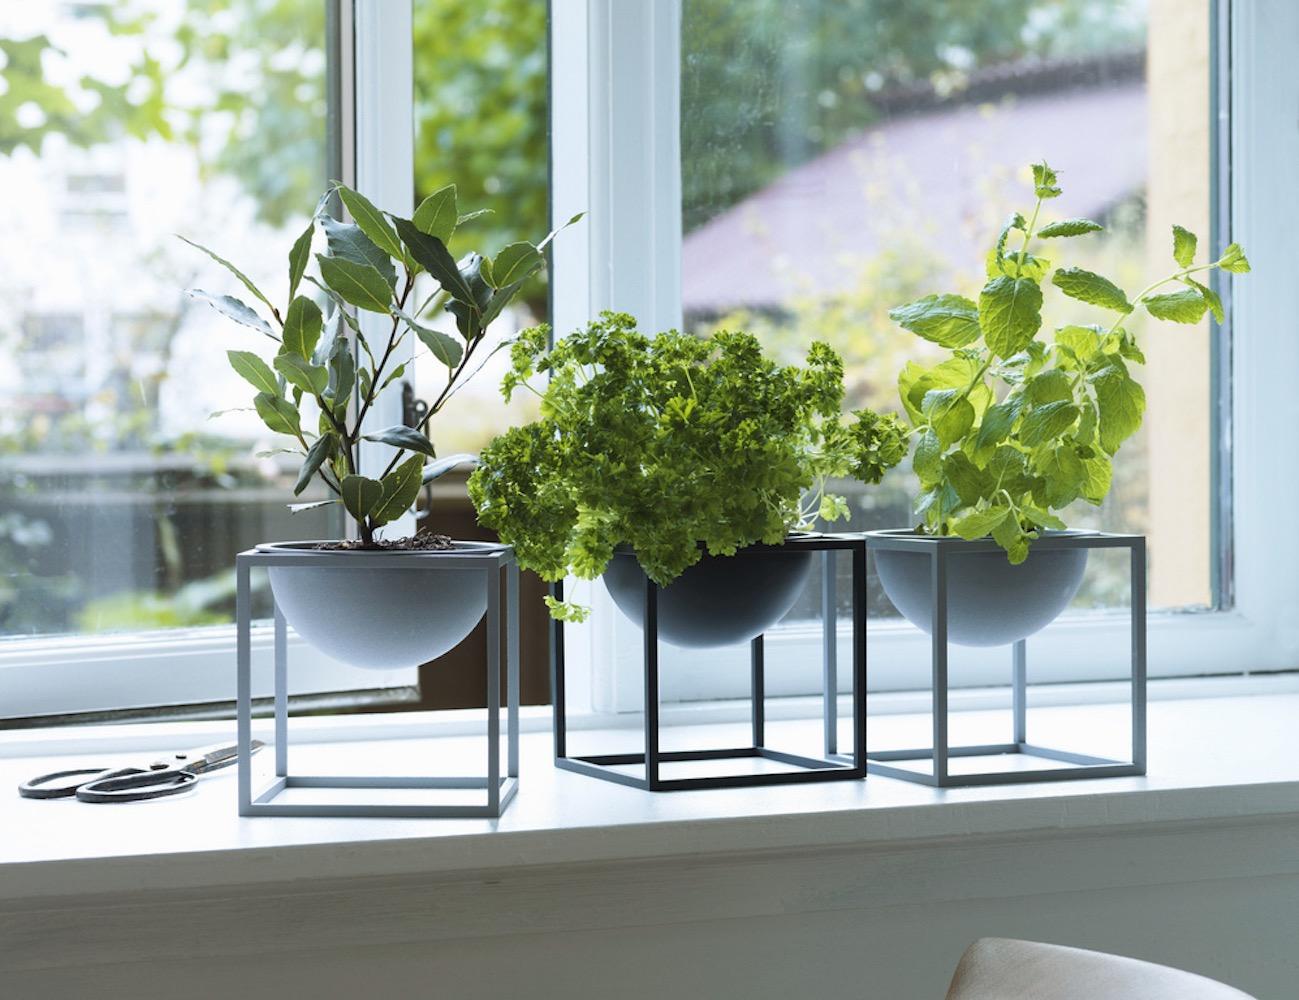 kubus bowls natural extension of kubus candleholder. Black Bedroom Furniture Sets. Home Design Ideas